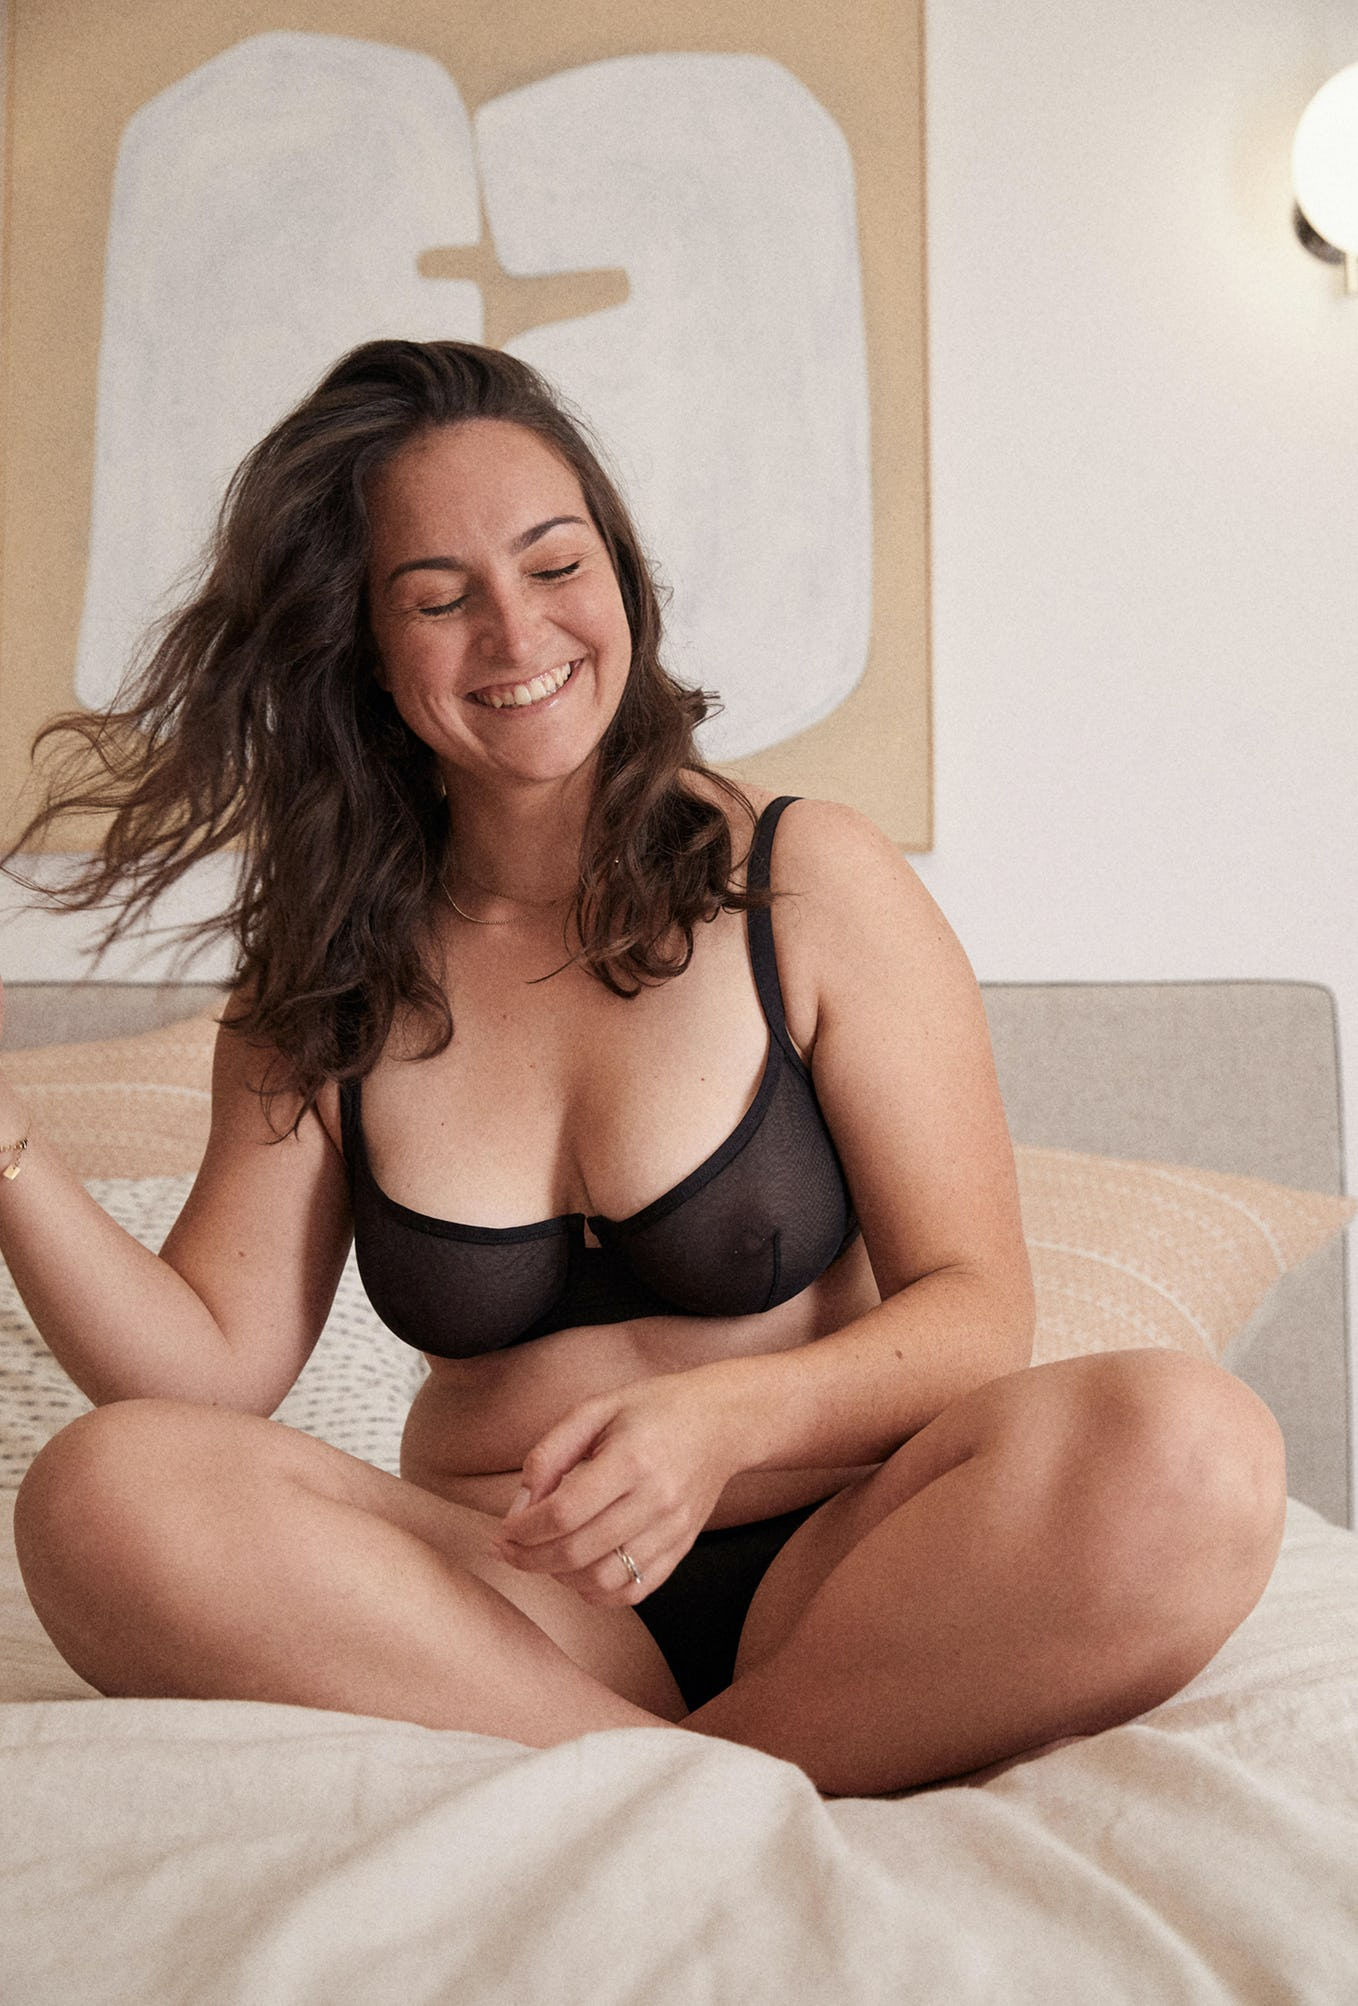 Half-cup bra Histoire de femmes in black